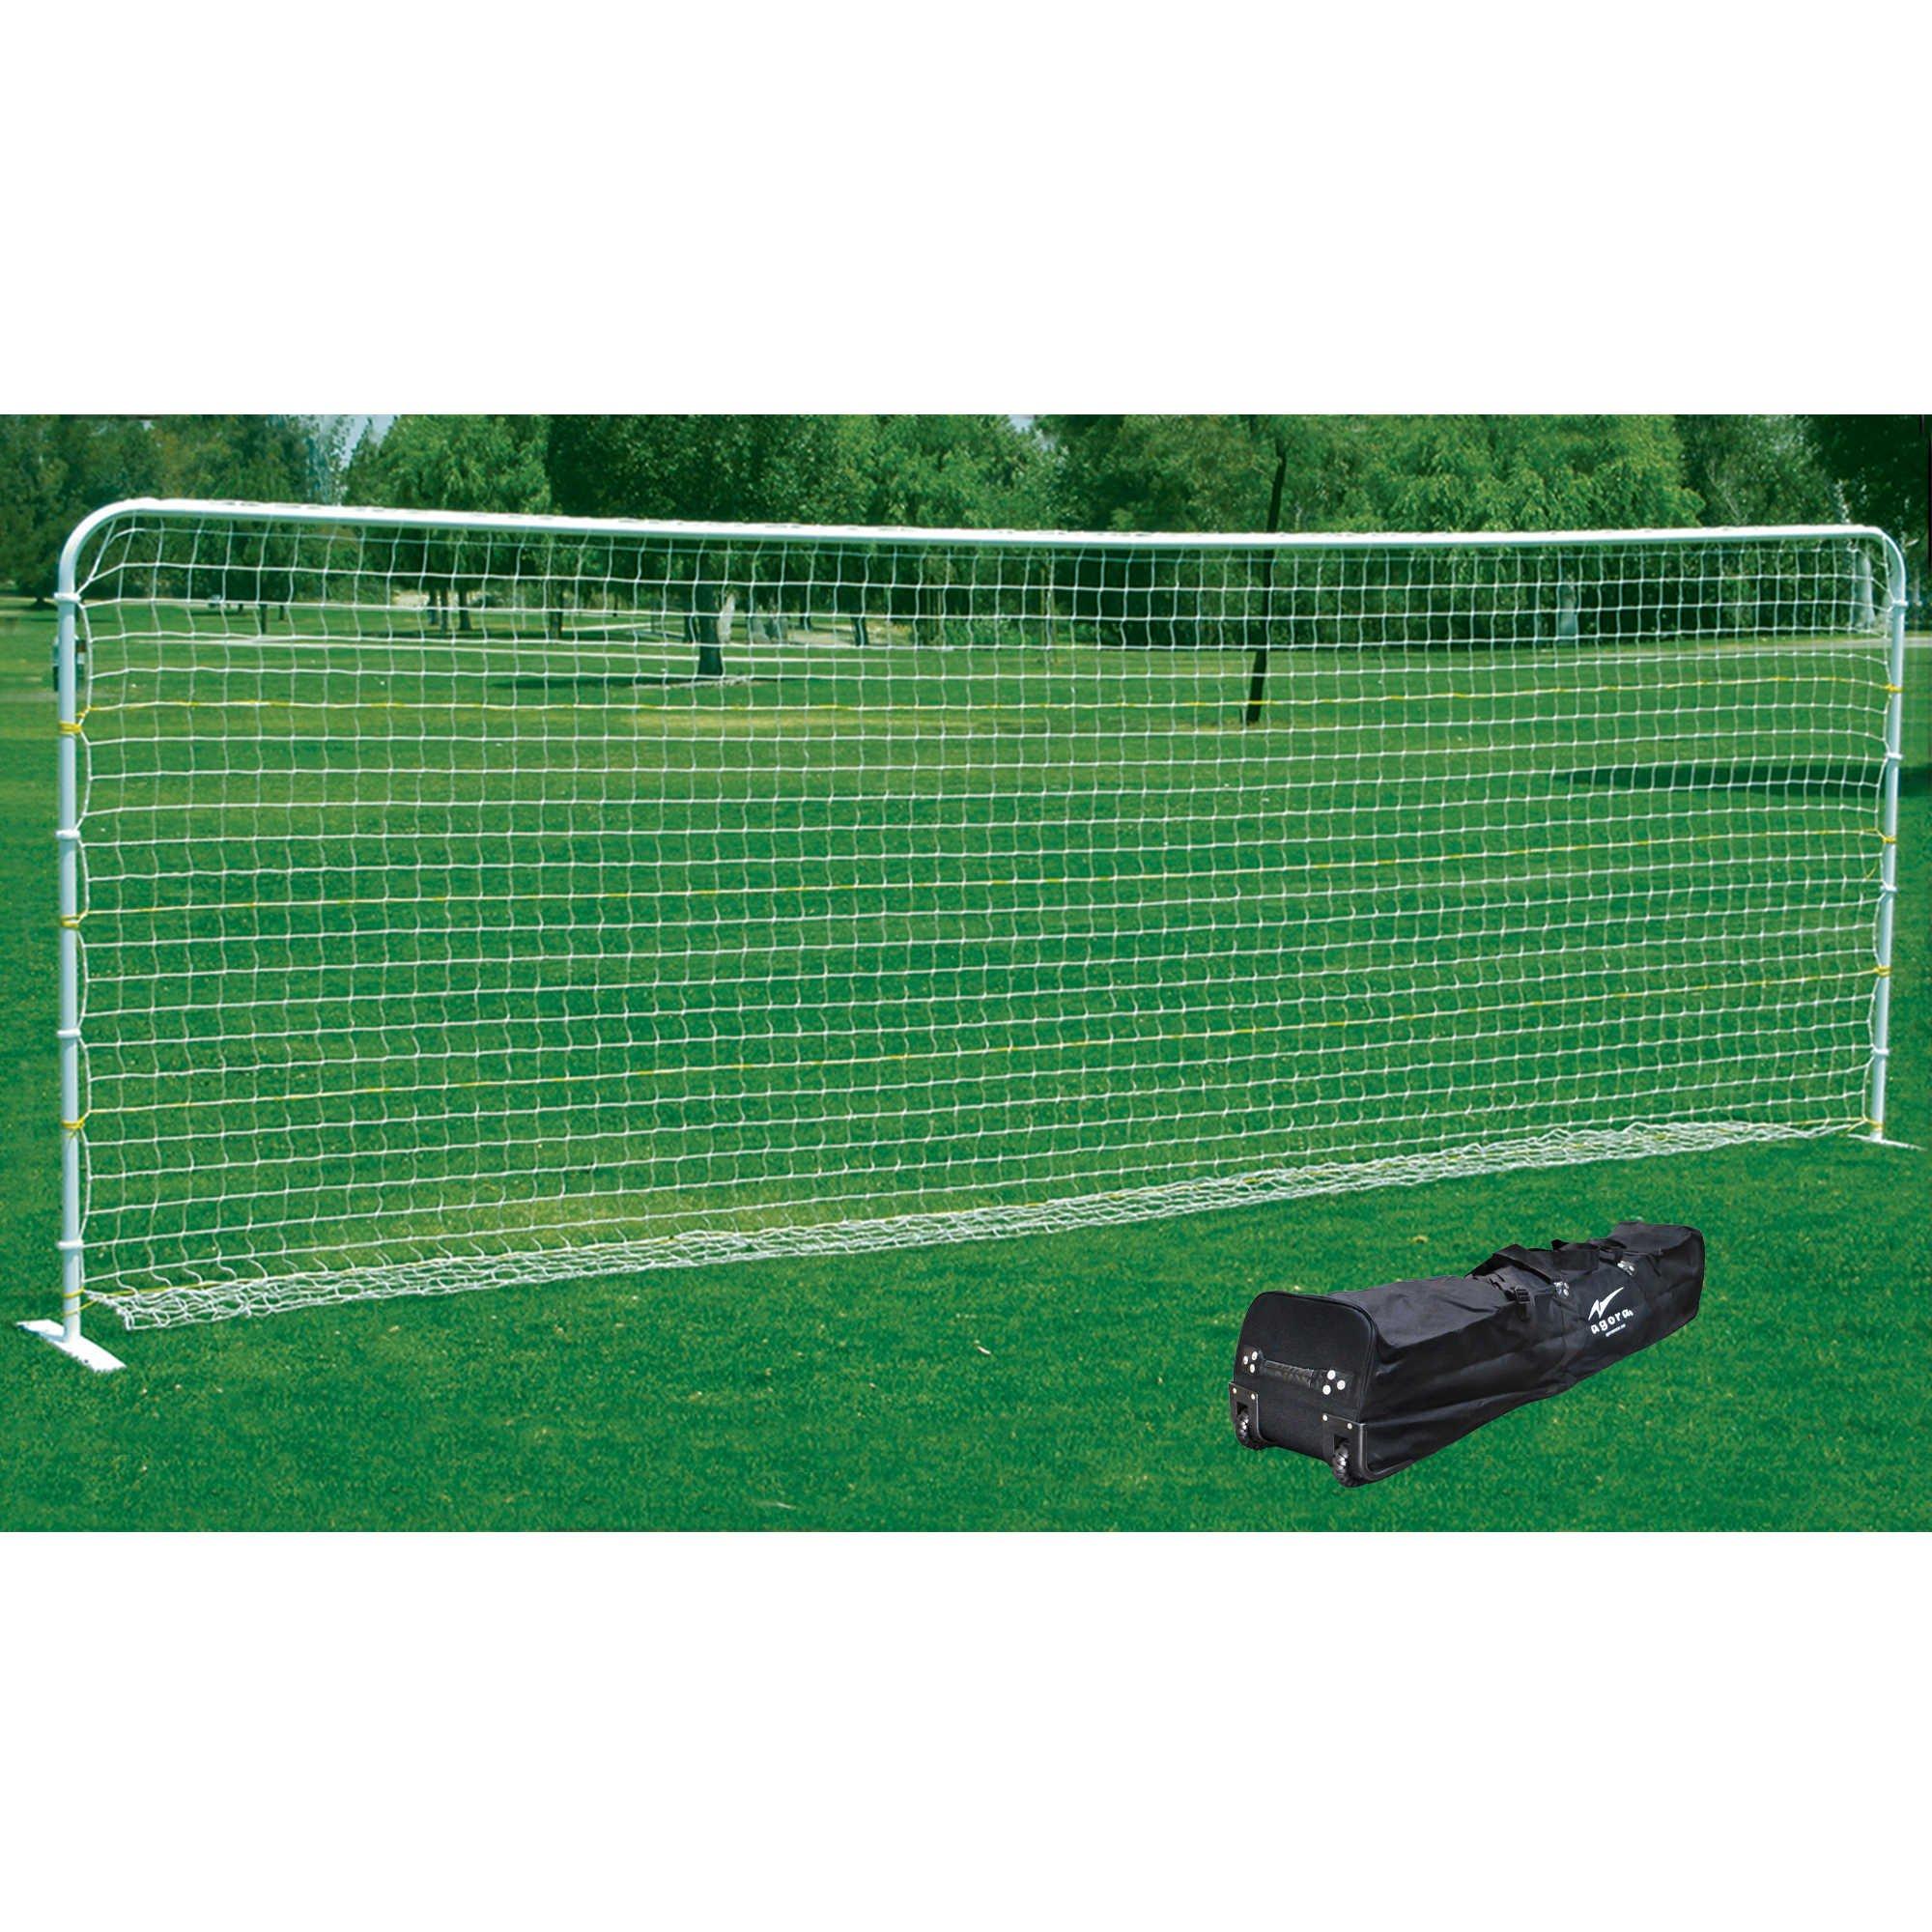 AGORA 6'6''x18' Aluminum Flat Training Goal